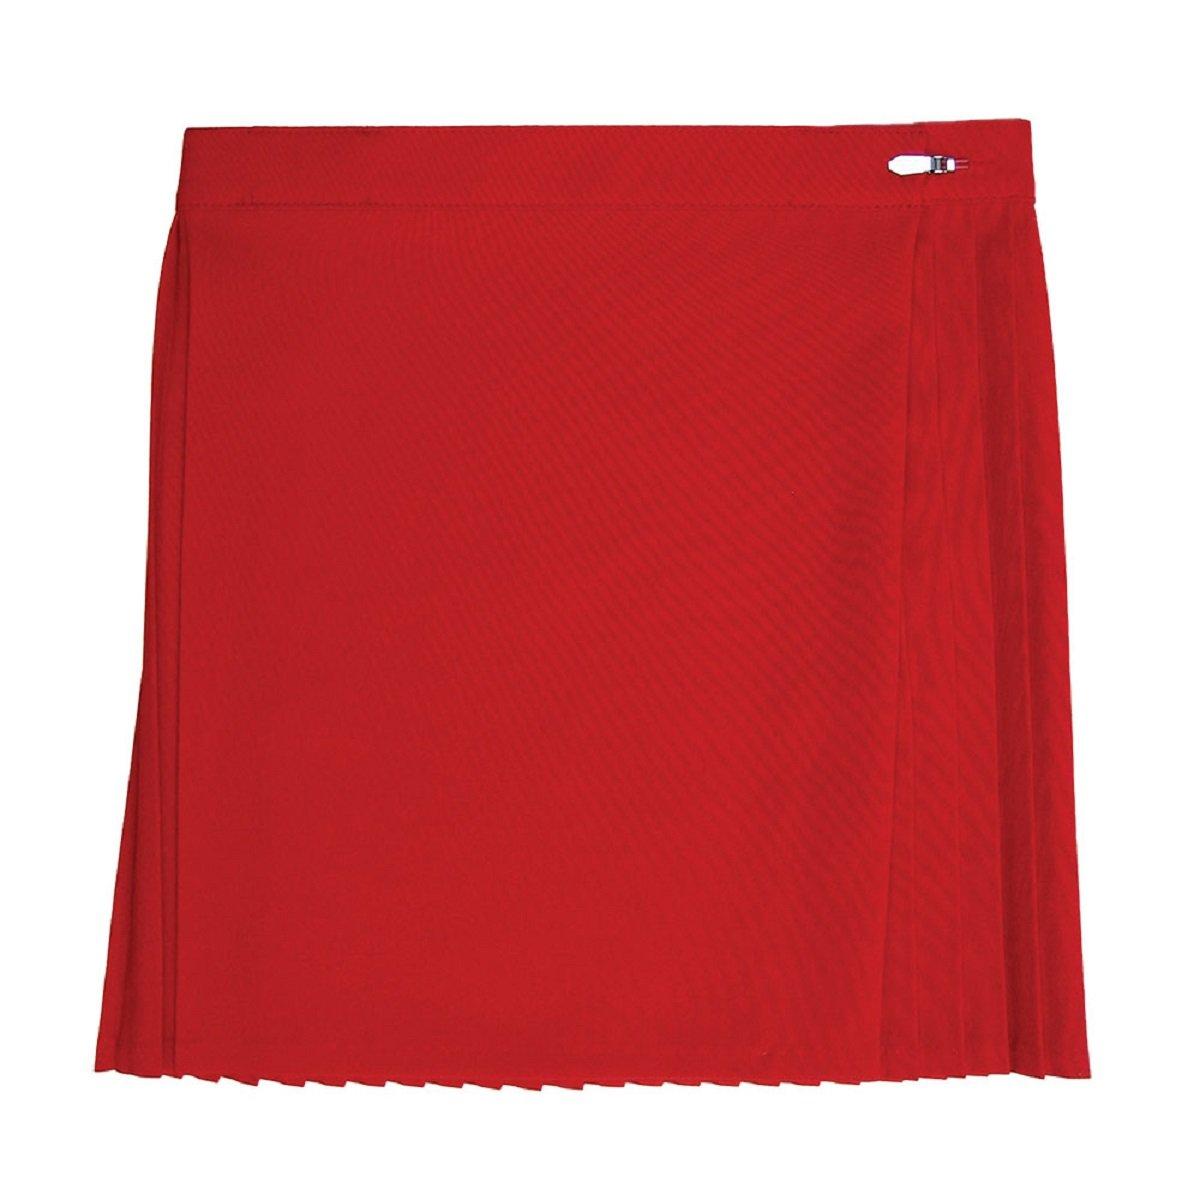 Ozmoint Girls School Uniform P.E. Hockey Netball Sports Sport Skirt Skirts Available in 9 Colours (Sizes 22-36 Waist)